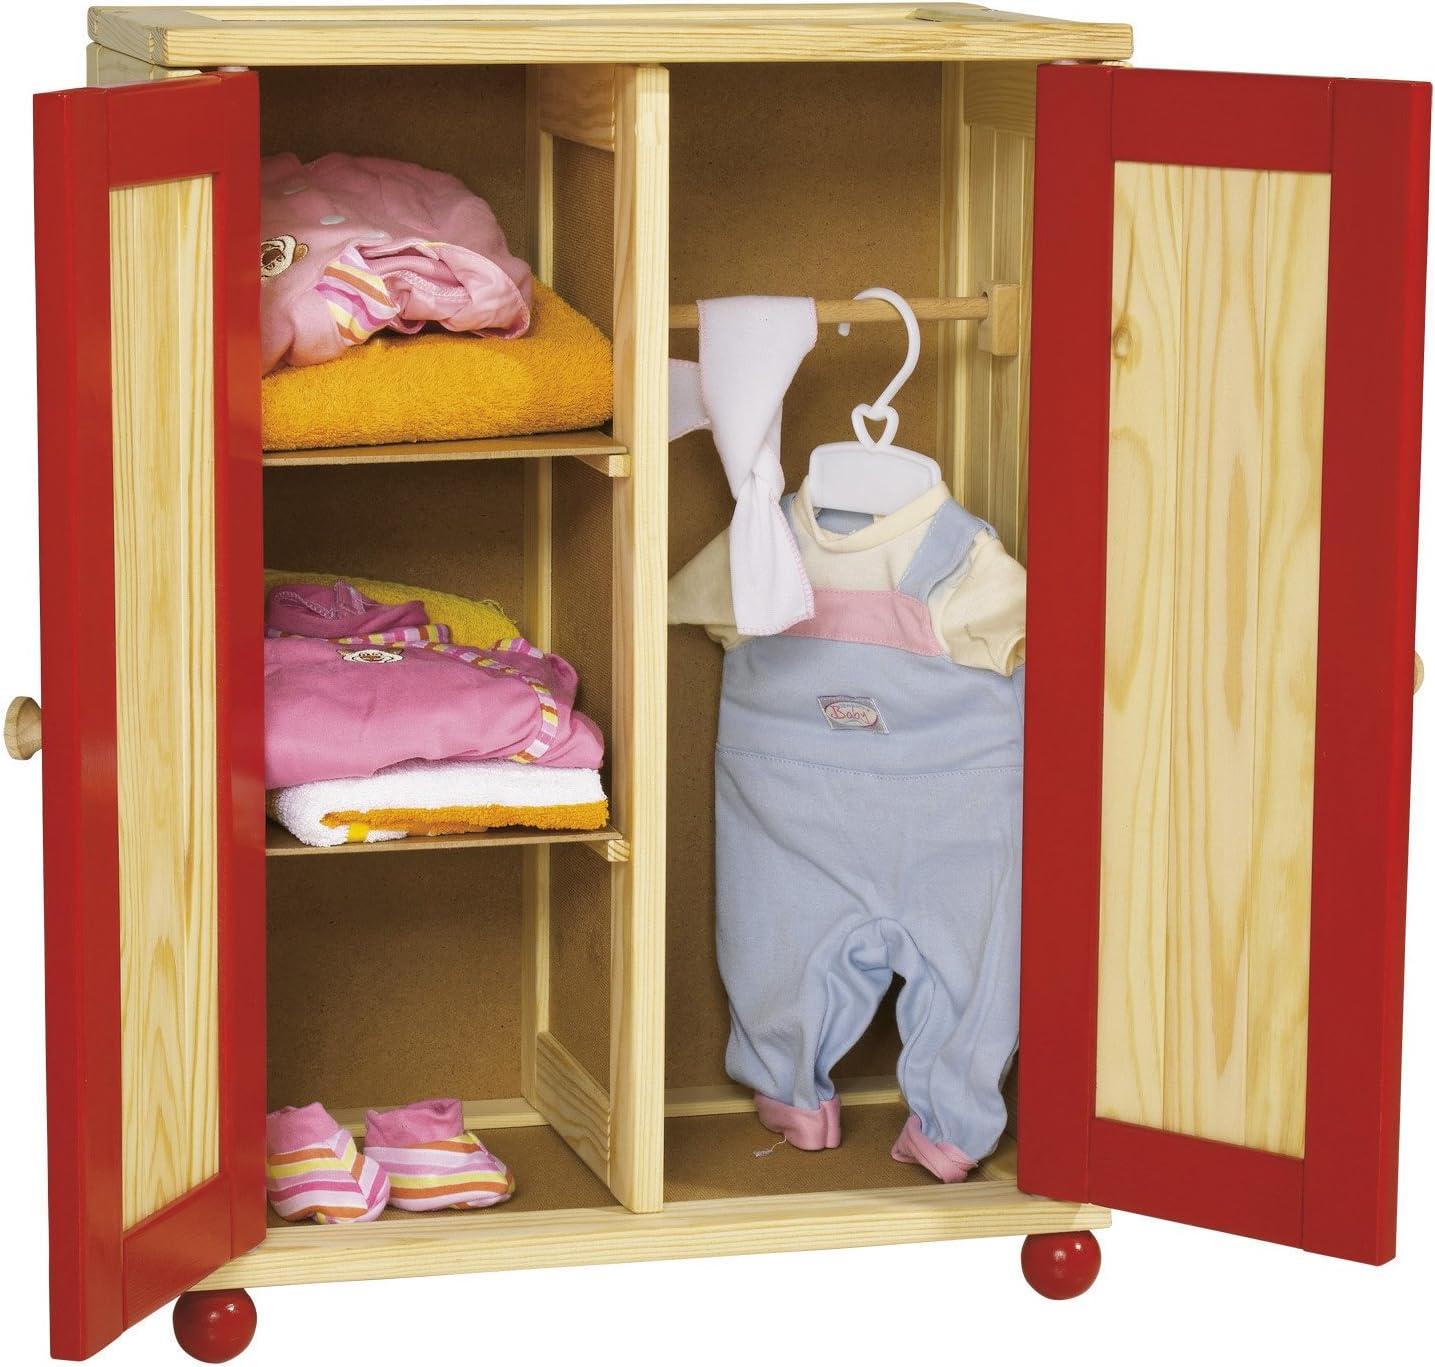 Howa Puppenschrank aus Holz Incl Kleiderb/ügel 2601